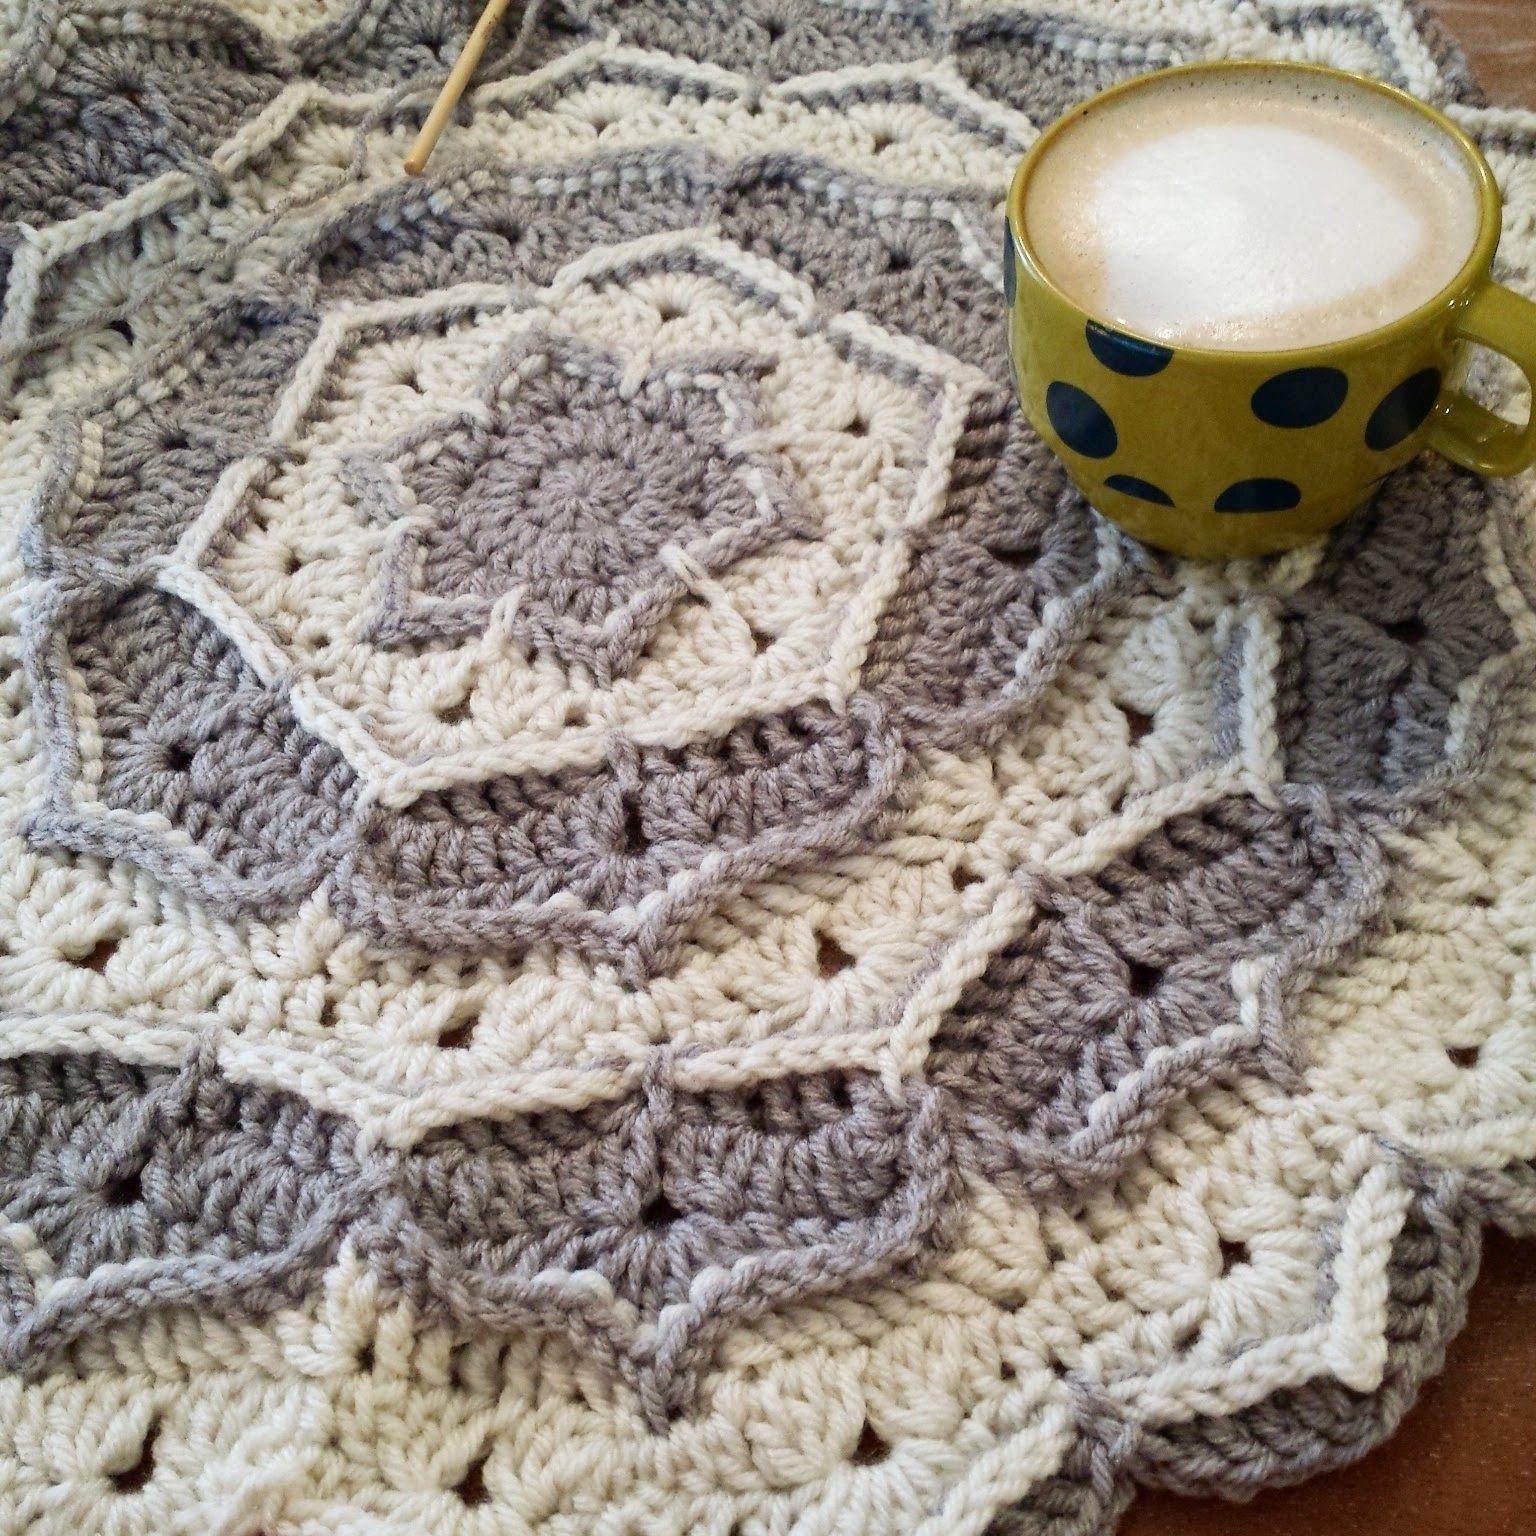 Concentric Circles Crochet Blanket | Crochet Patterns | Pinterest ...